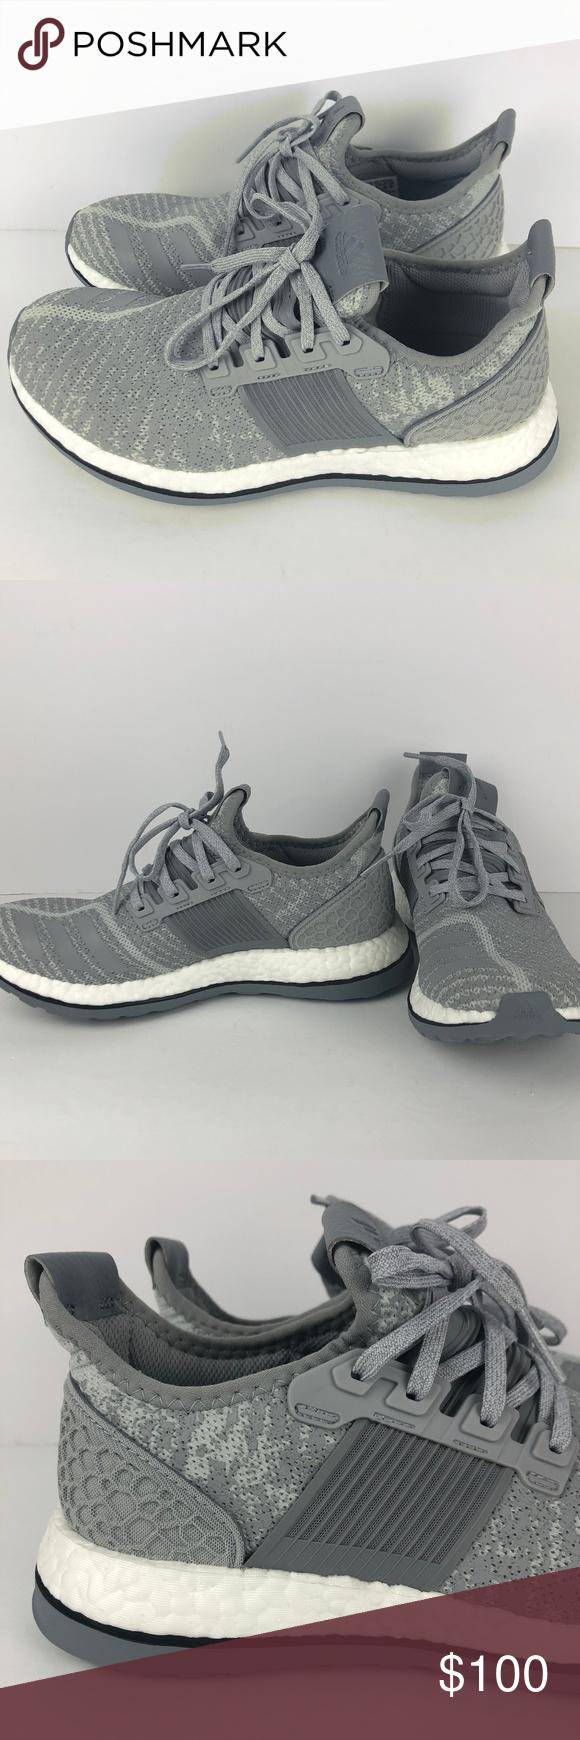 358994fb55762 Adidas Pure Boost ZG Grey White Training Running Item  NEW Adidas Pure  Boost ZG Grey